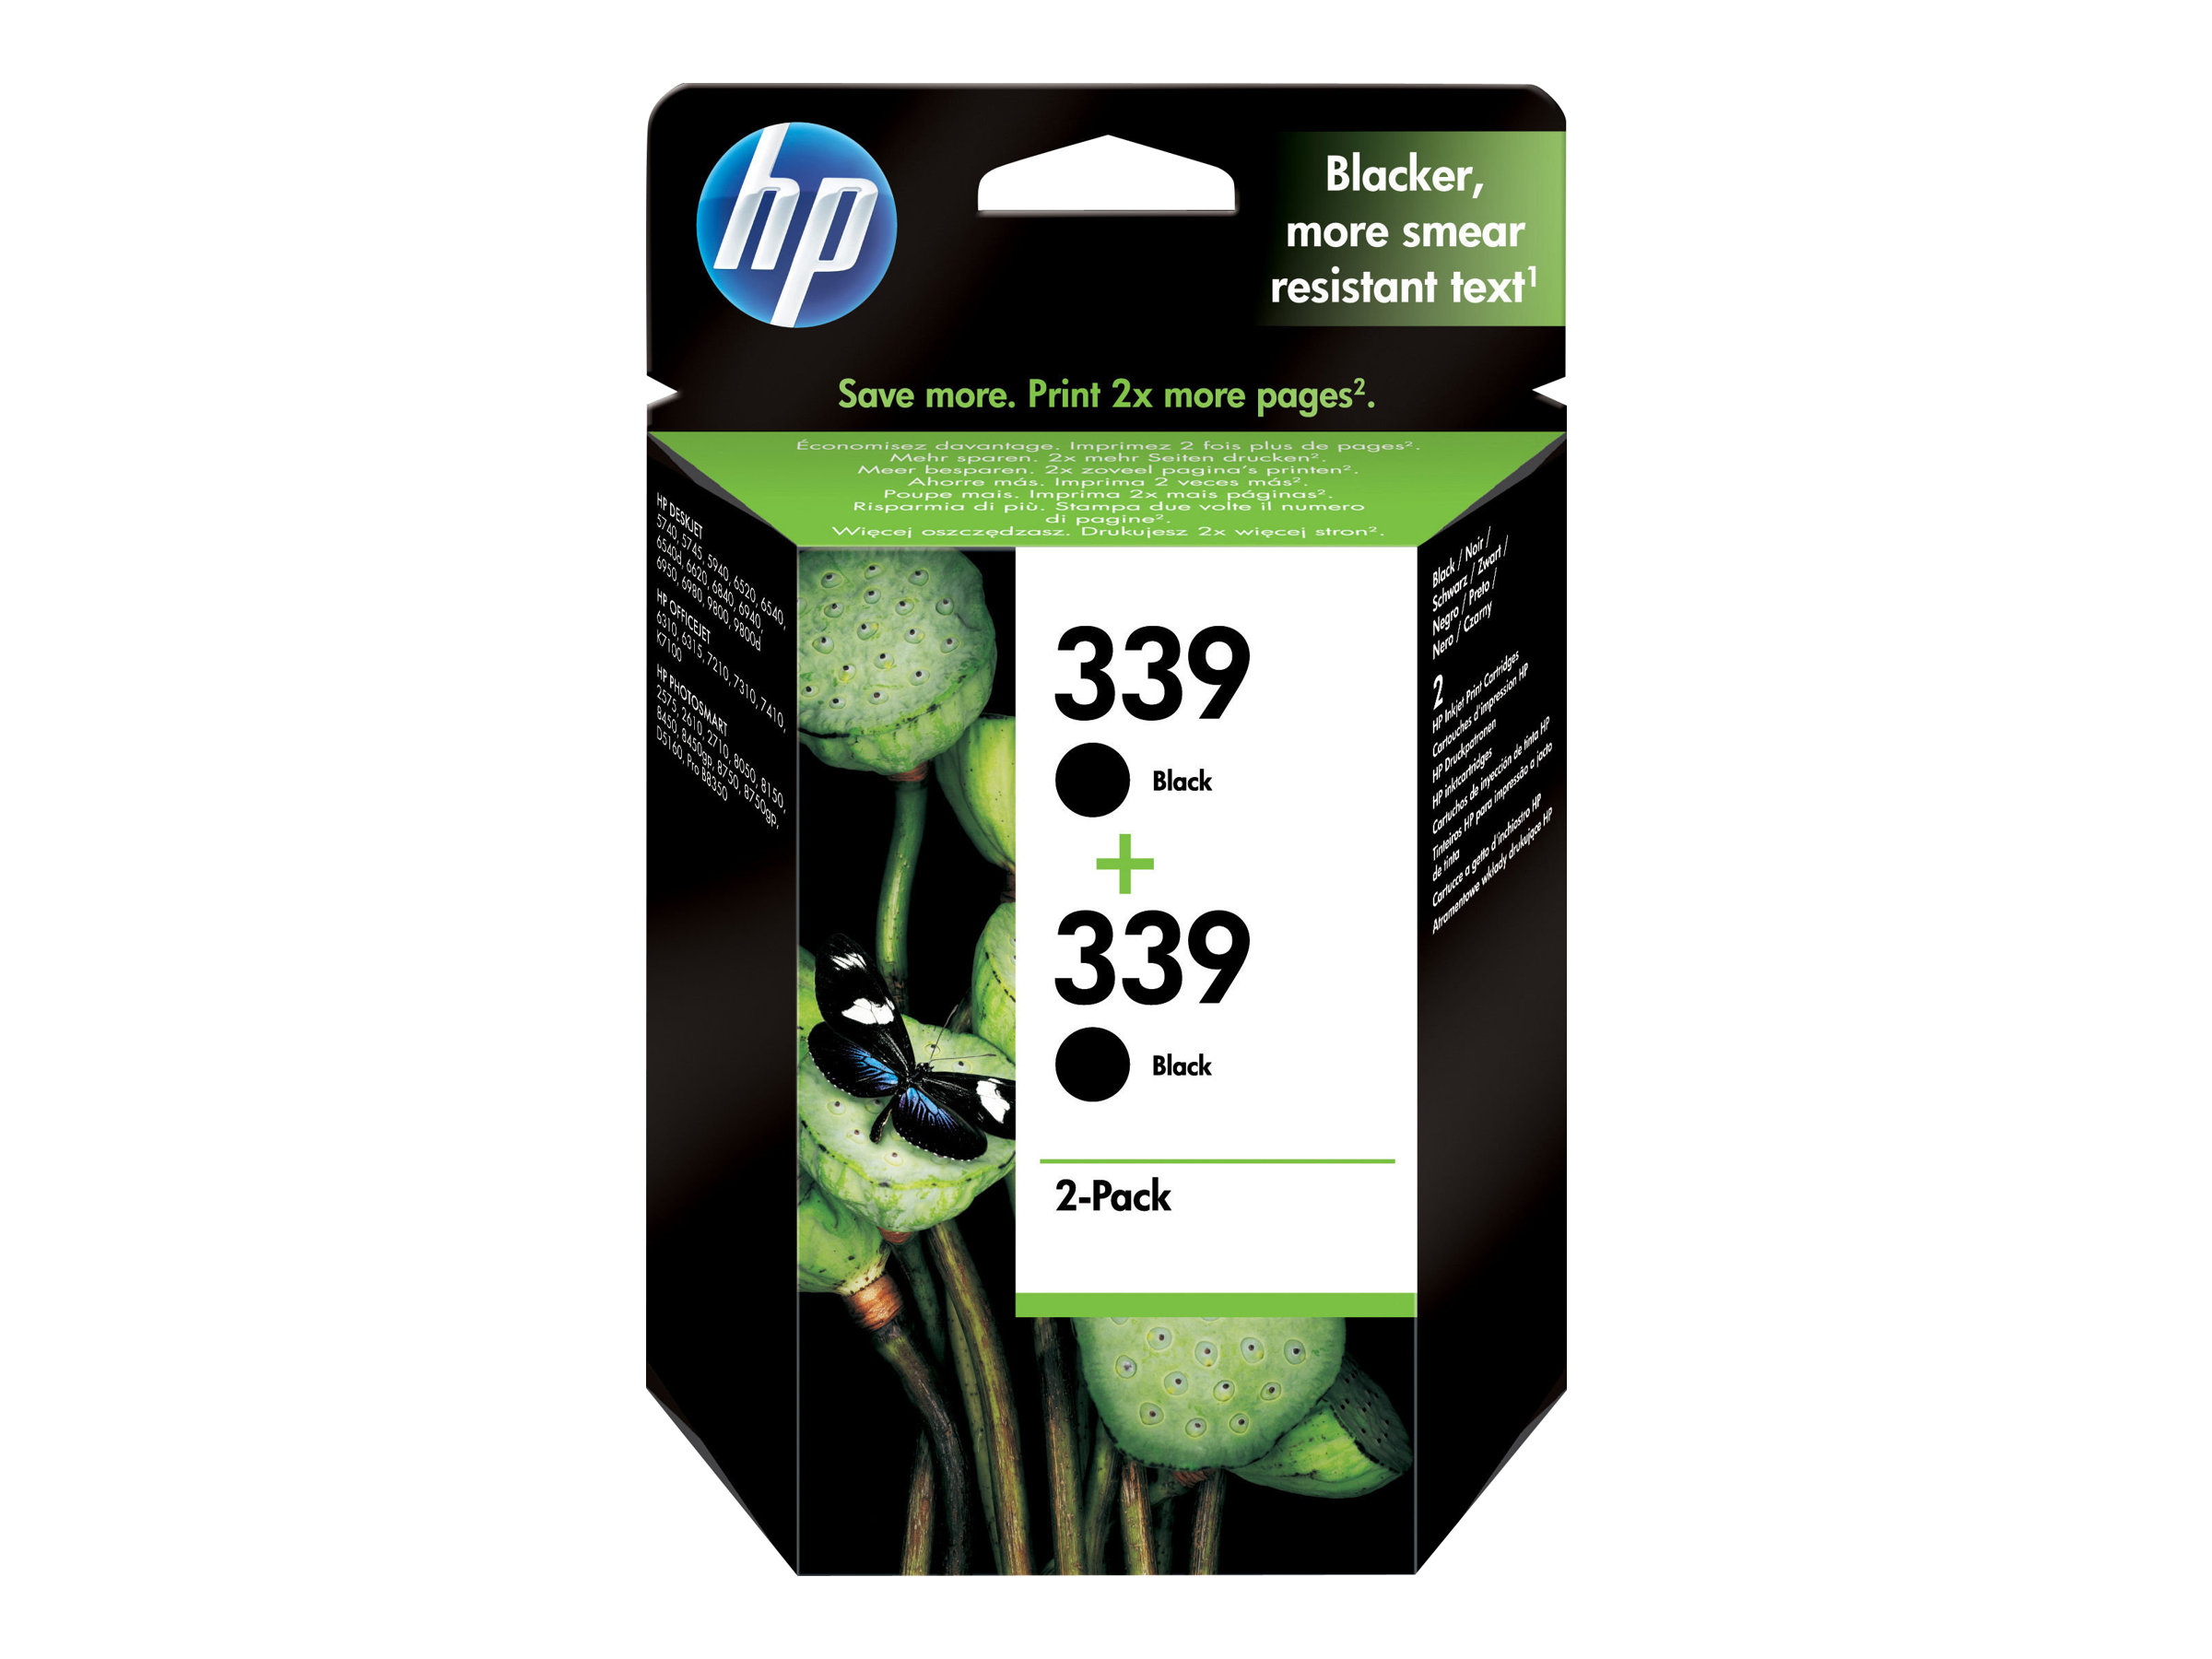 HP Tinte black Nr. 339 (C9504EE) ca. 860 Seiten, Doppelpack